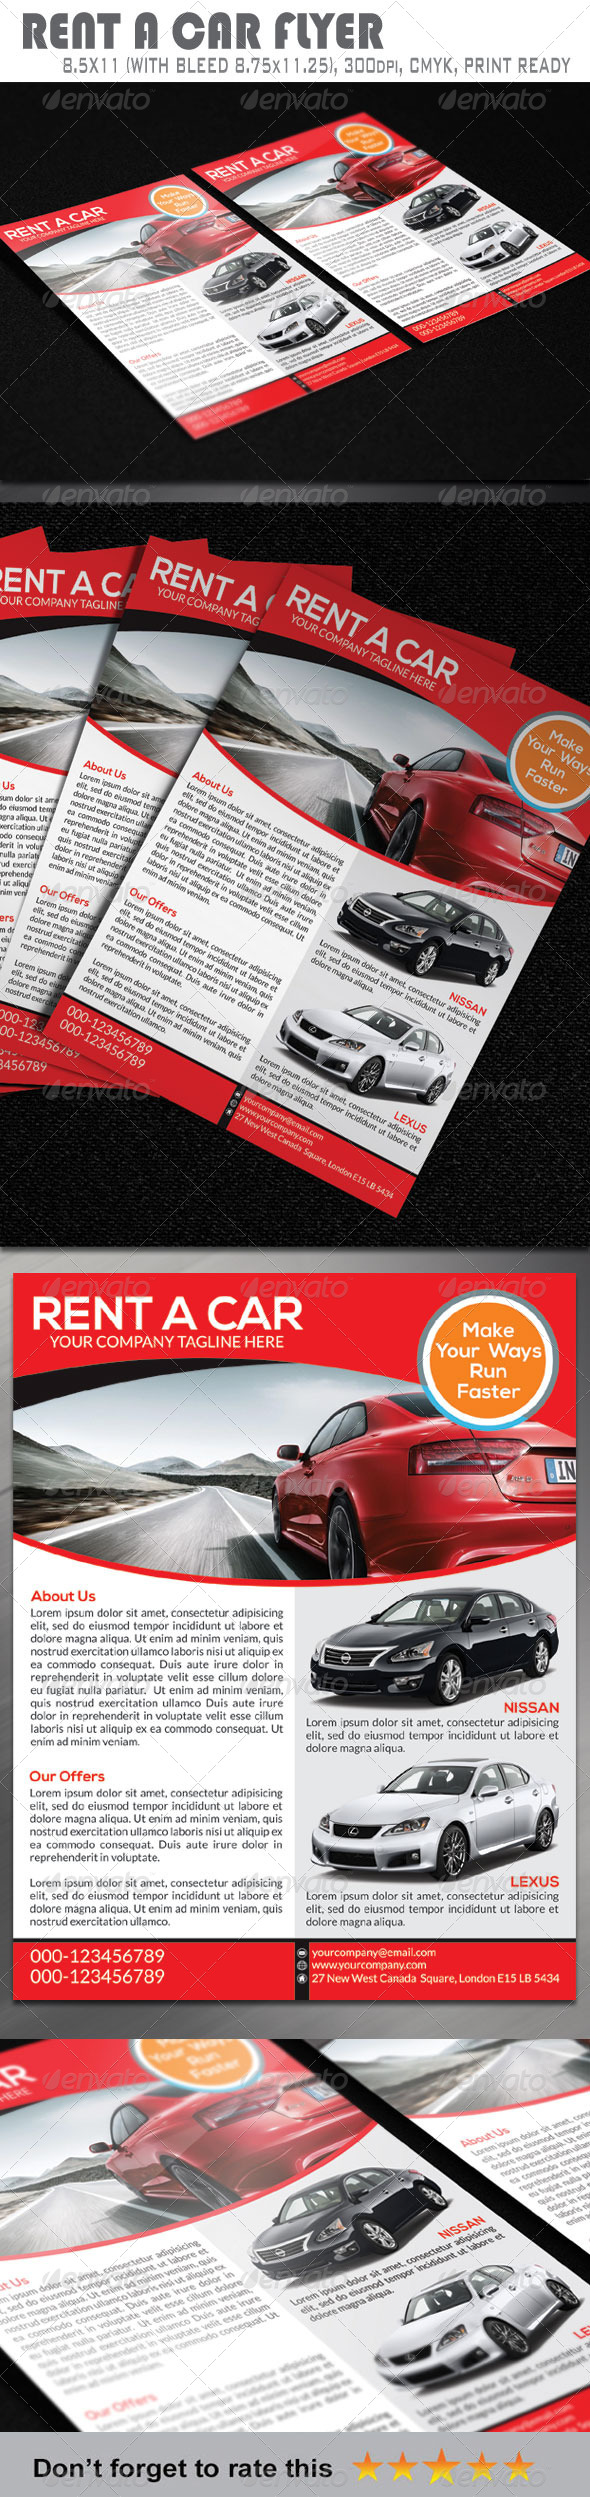 GraphicRiver Rent A Car Flyer 6675675